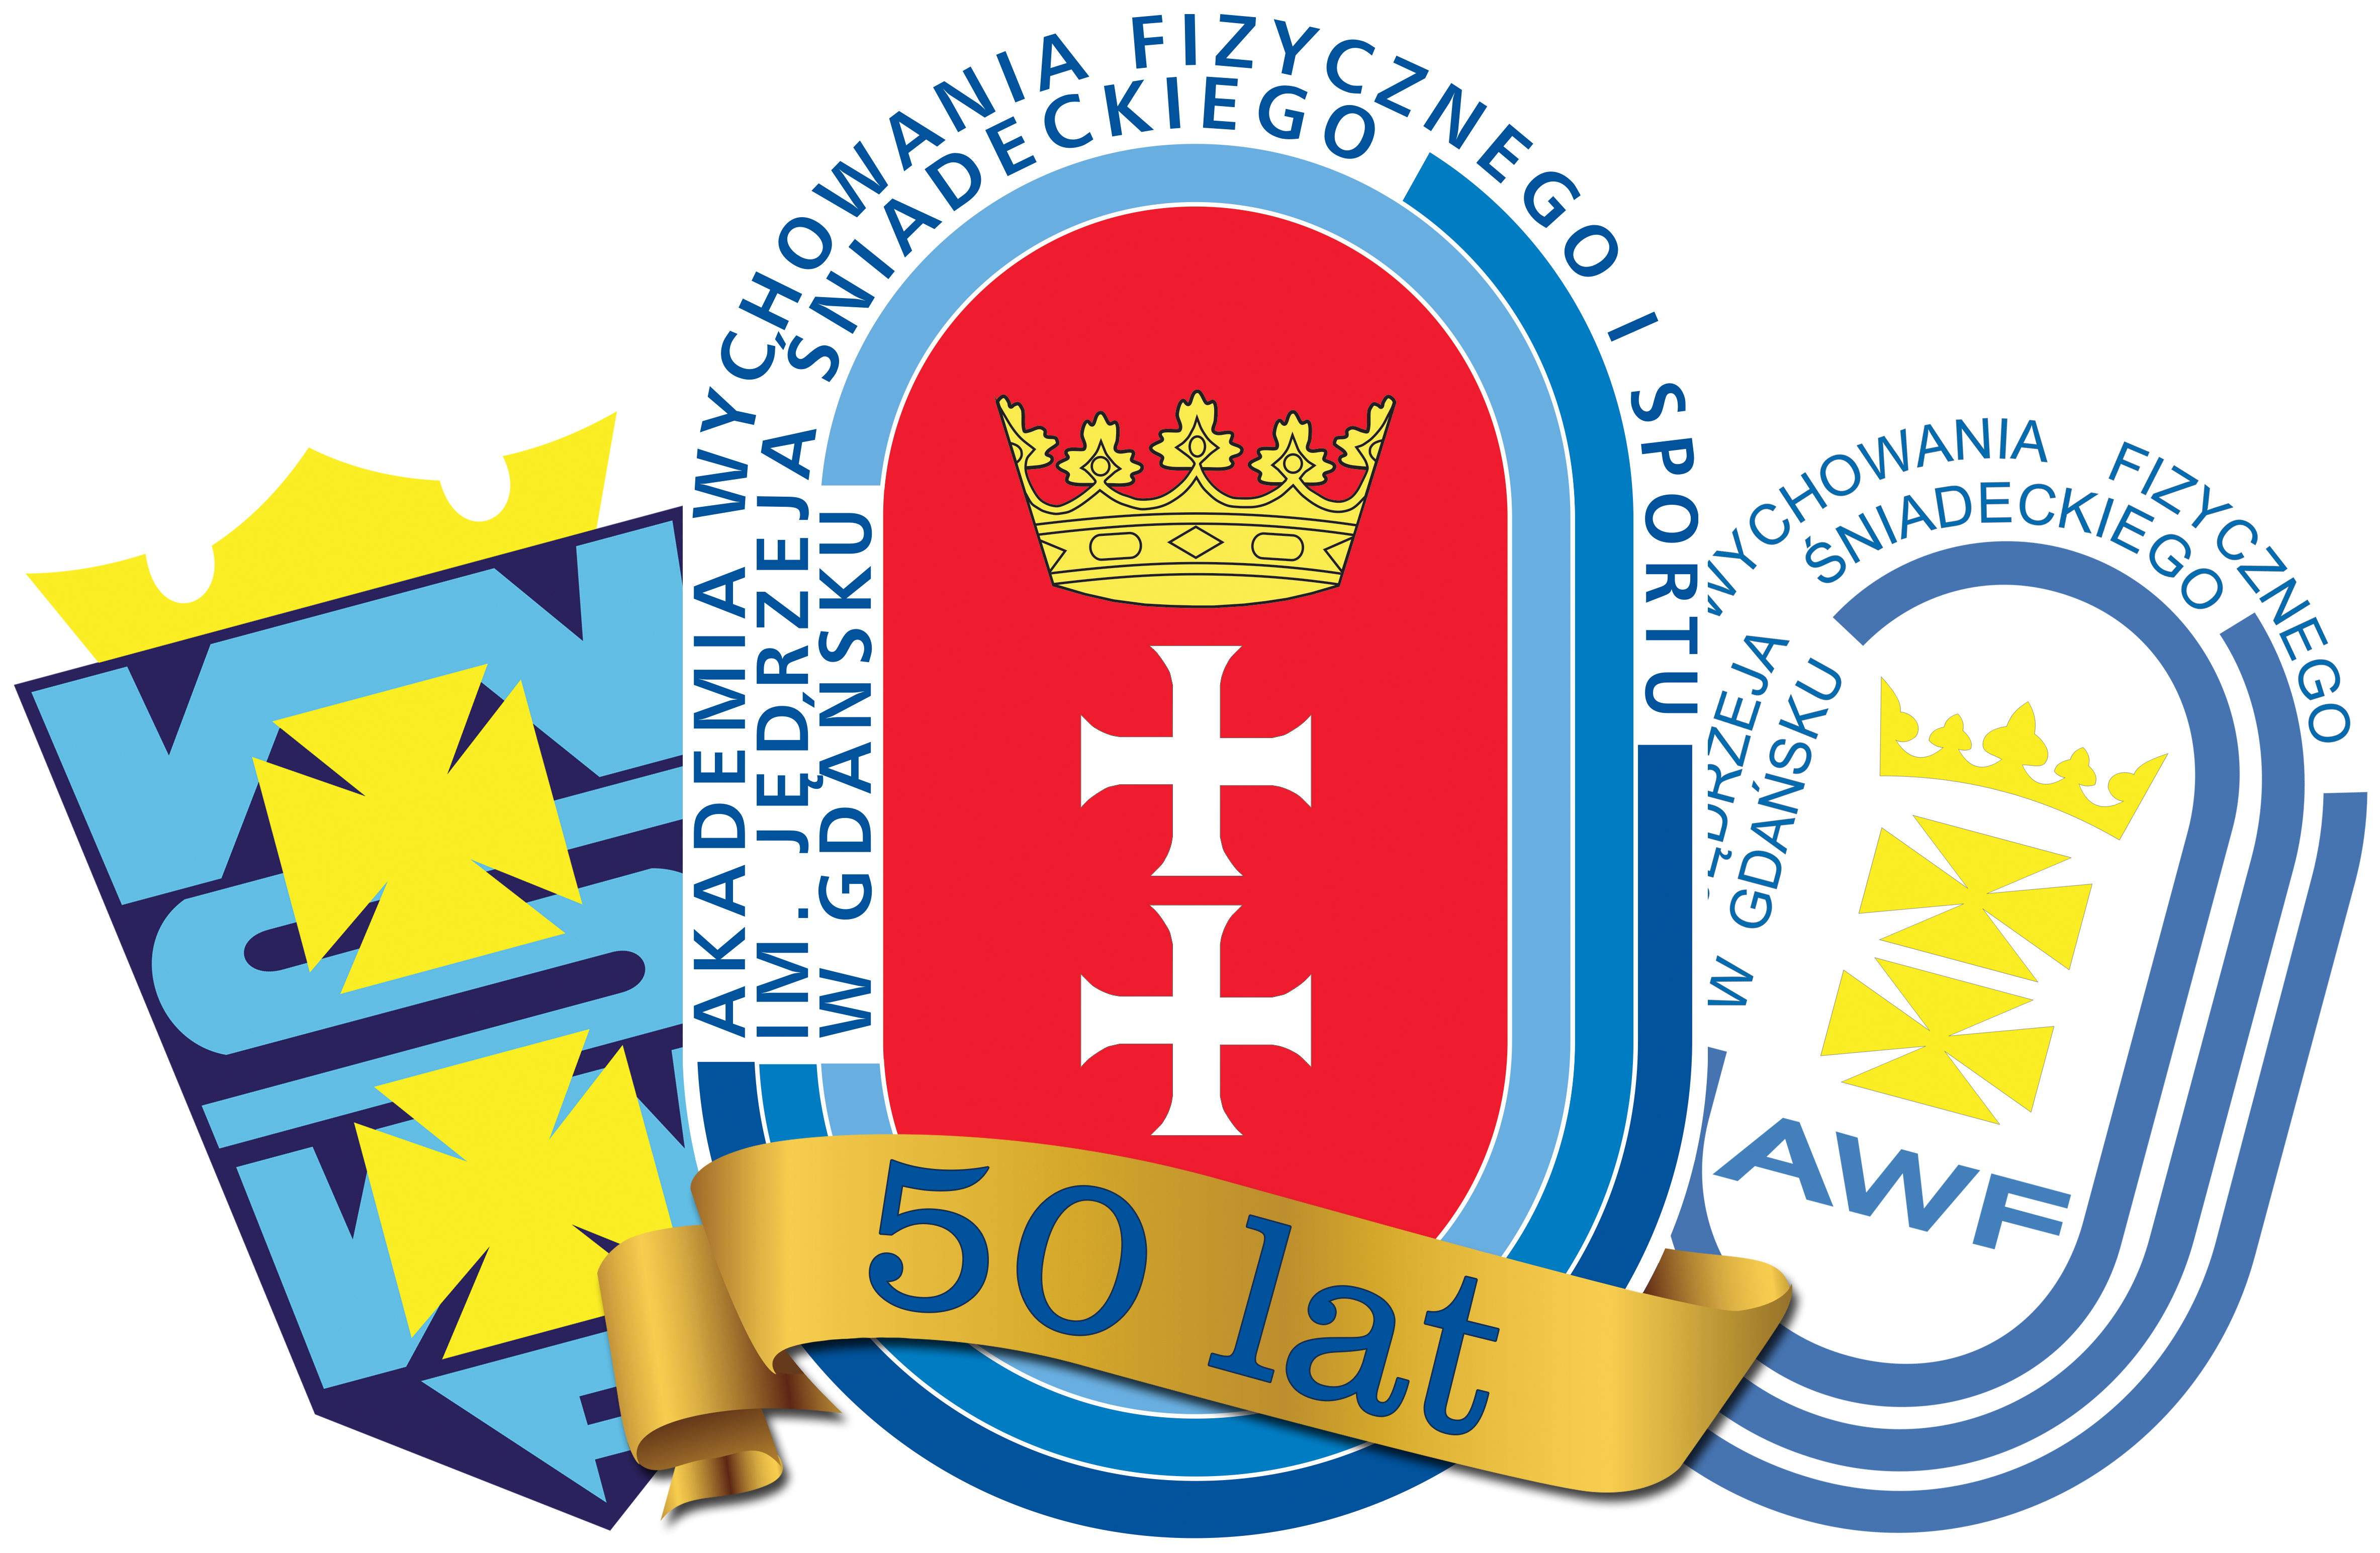 http://pfnw.eu/wp-content/uploads/2018/04/logo50lat_duze_transparent-1.png